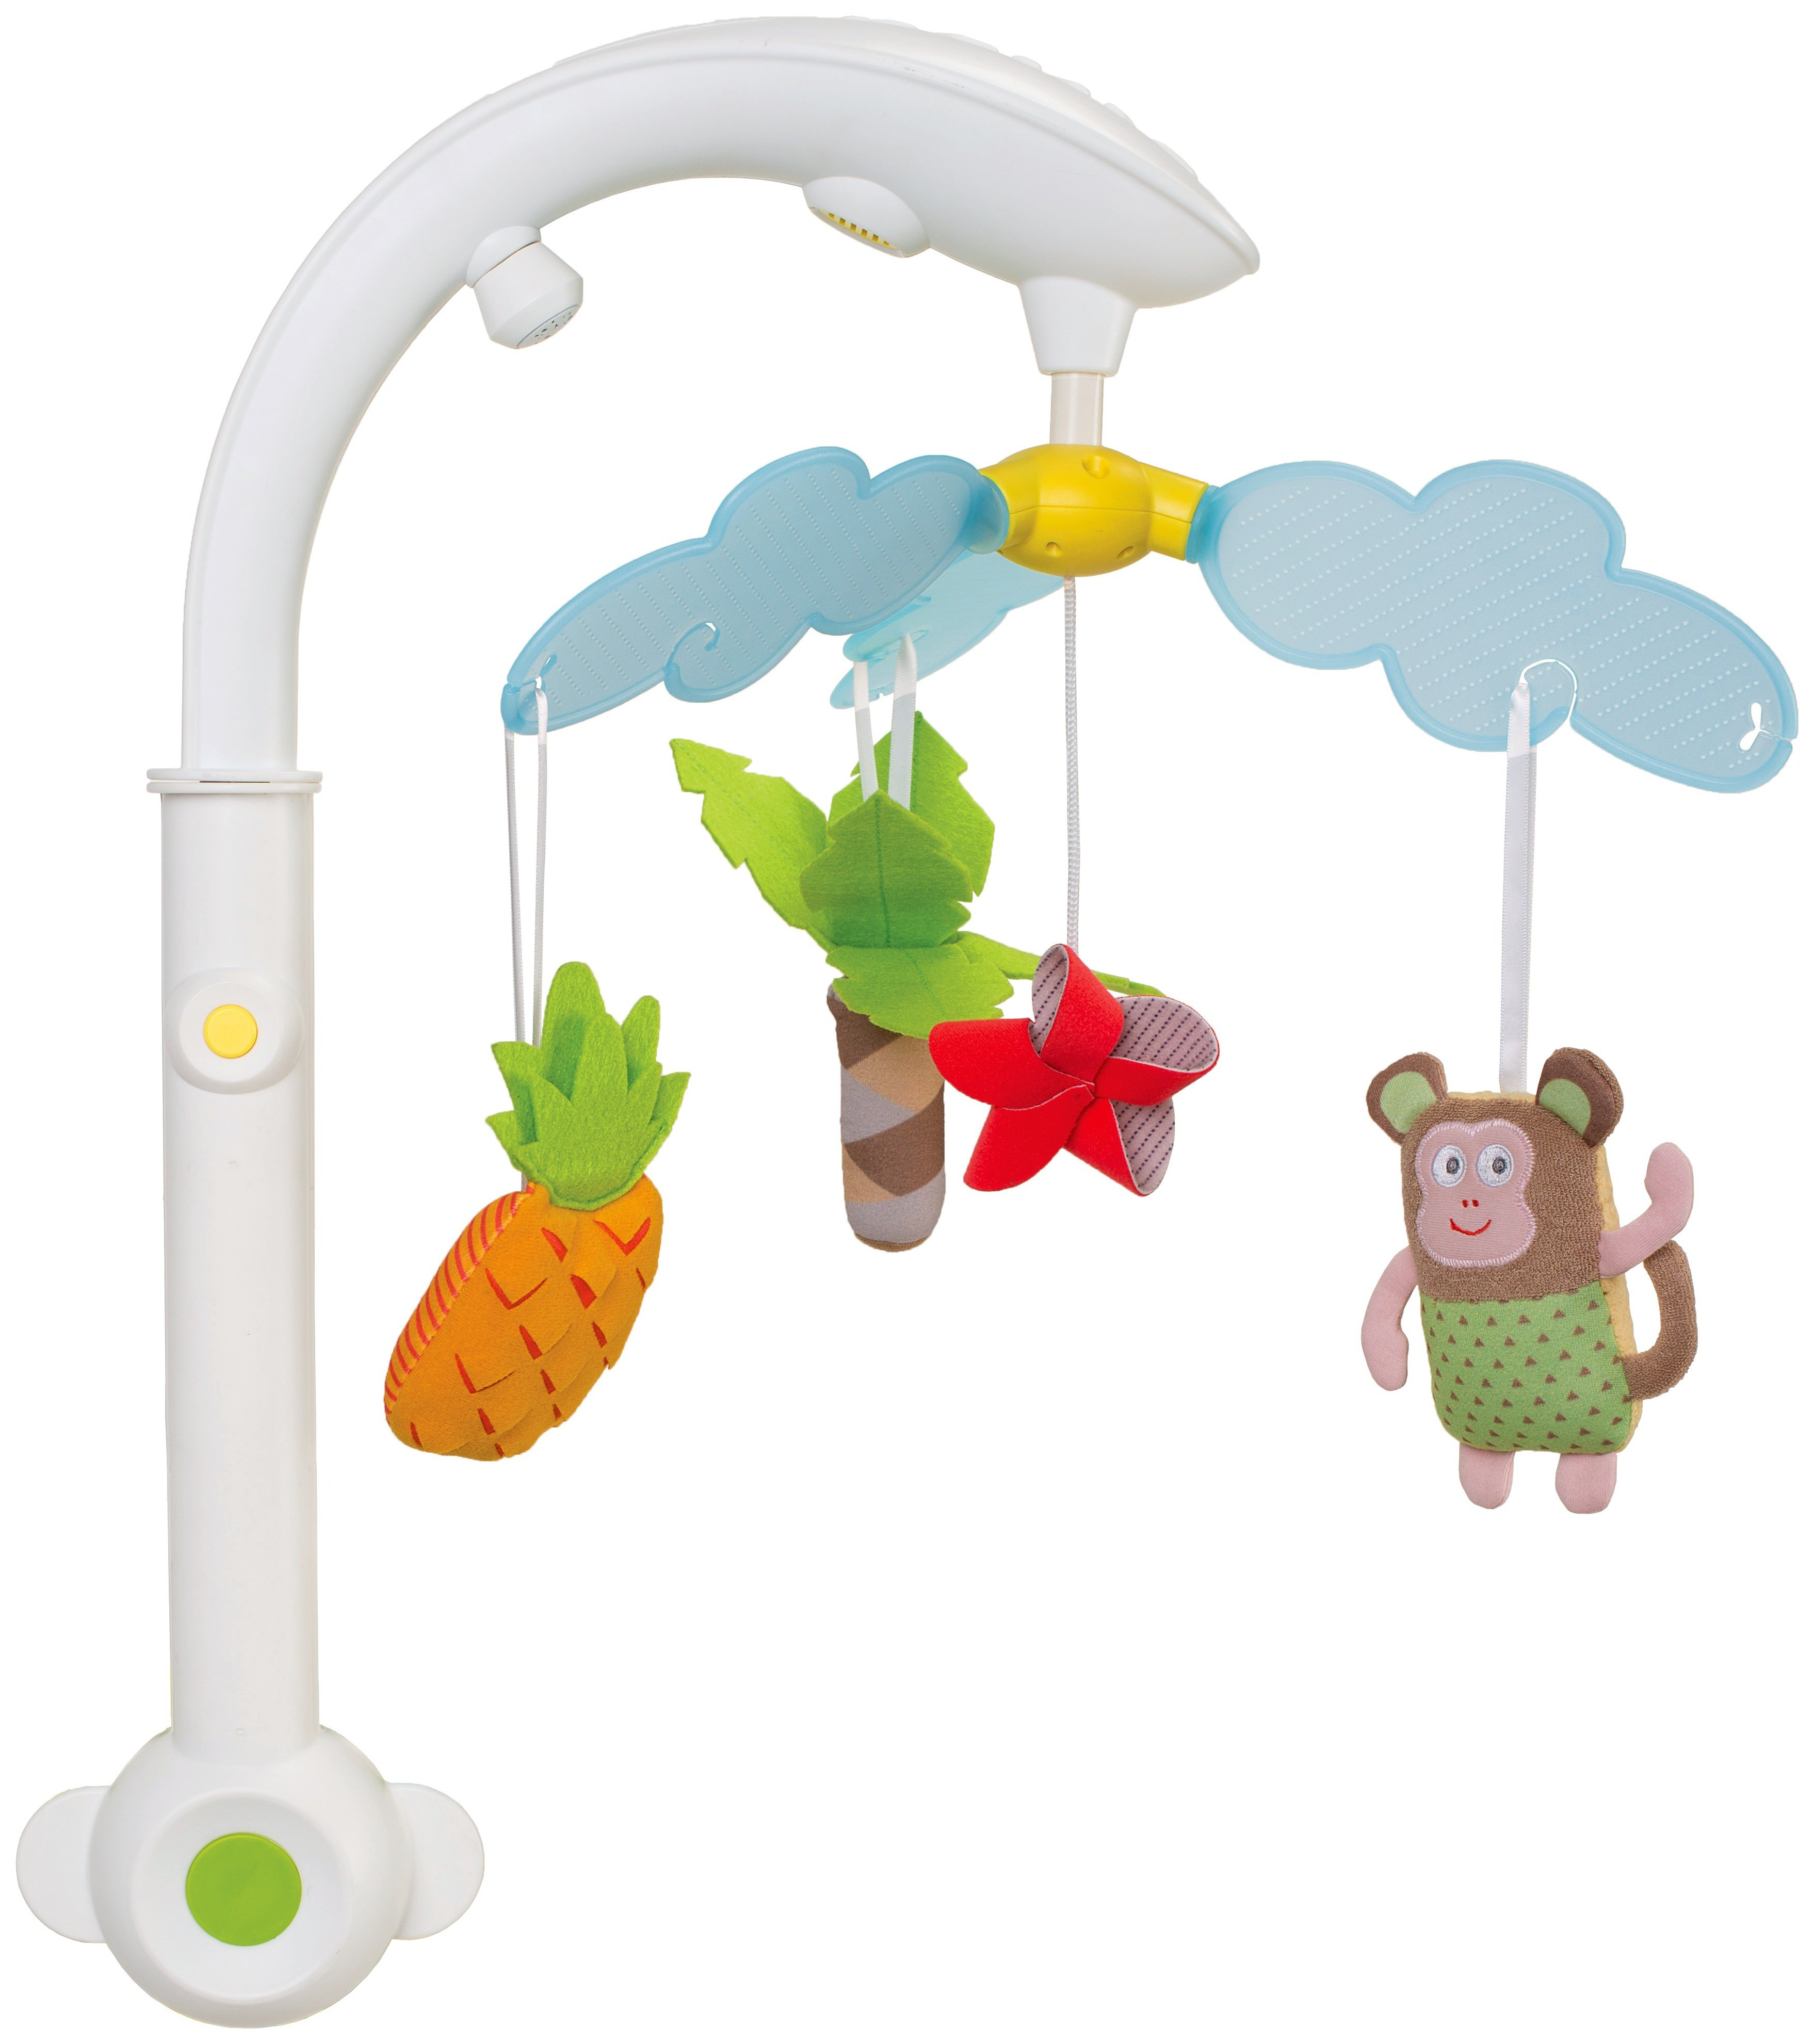 Taf Toys Tropical Mobile.